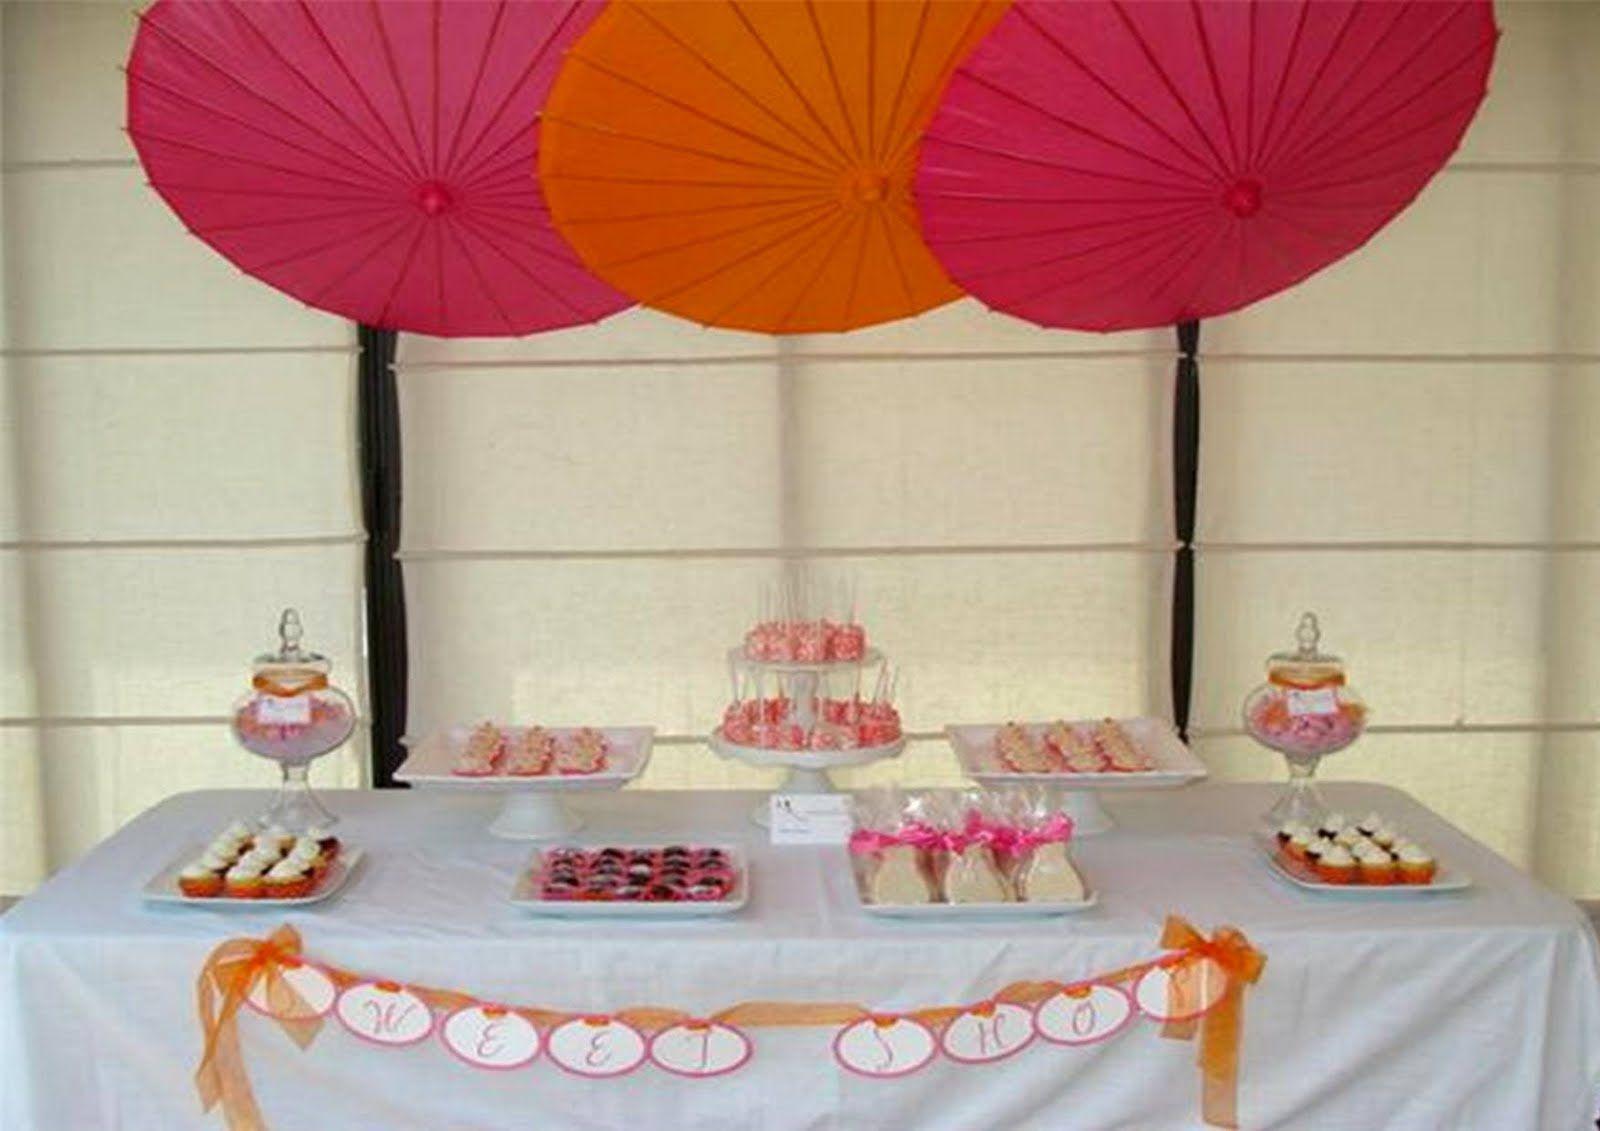 Icing Designs: Pink and Orange Bridal Shower | Ring a ding. Wedding ...